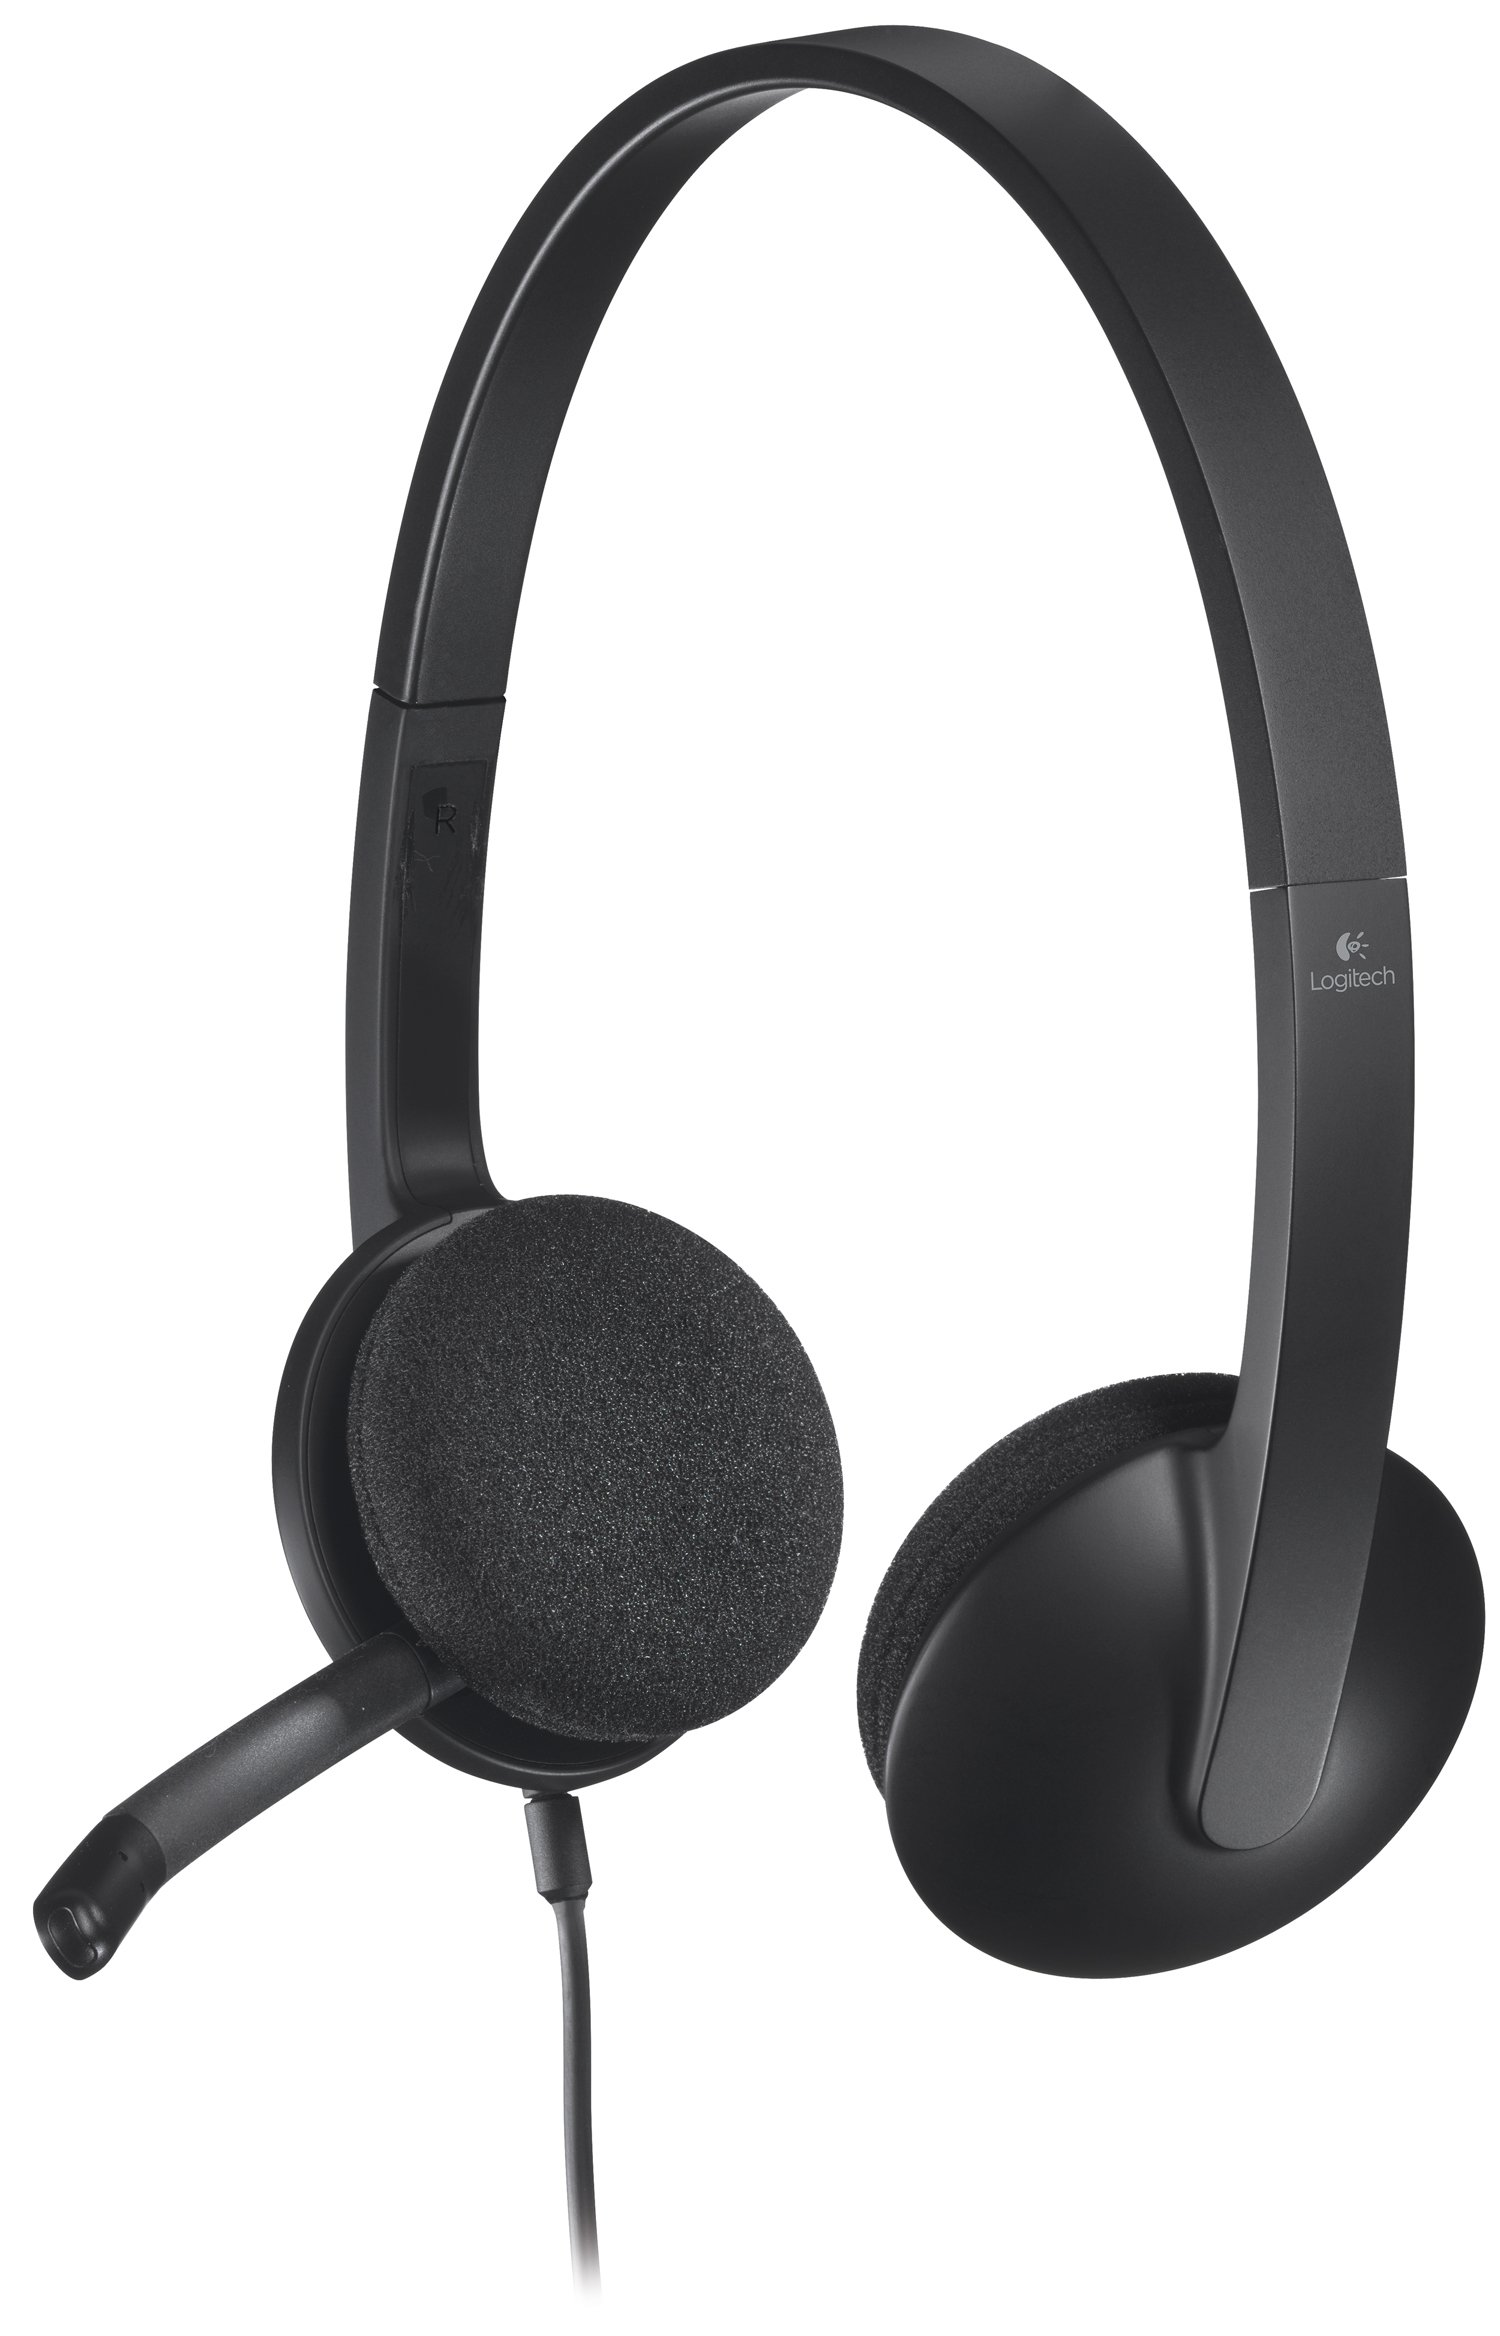 Logitech USB Headset H340, Stereo, USB Headset for Windows and Mac